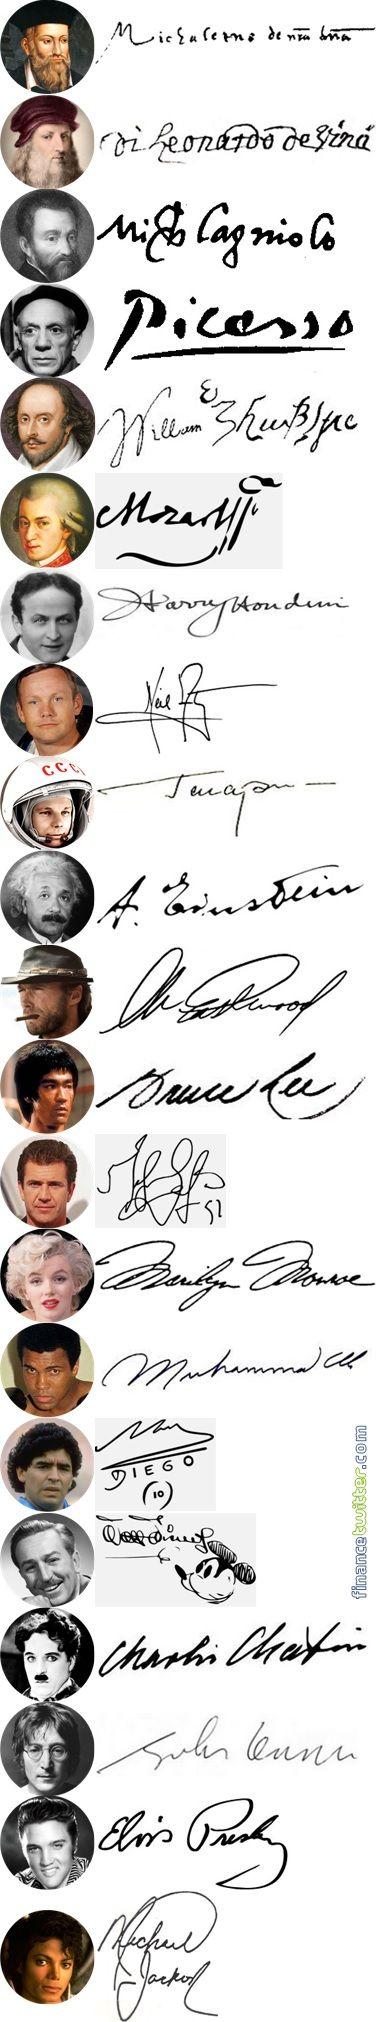 50 Rich & Famous People Signatures - Genius, Actor, Actress, Musicians, Singer